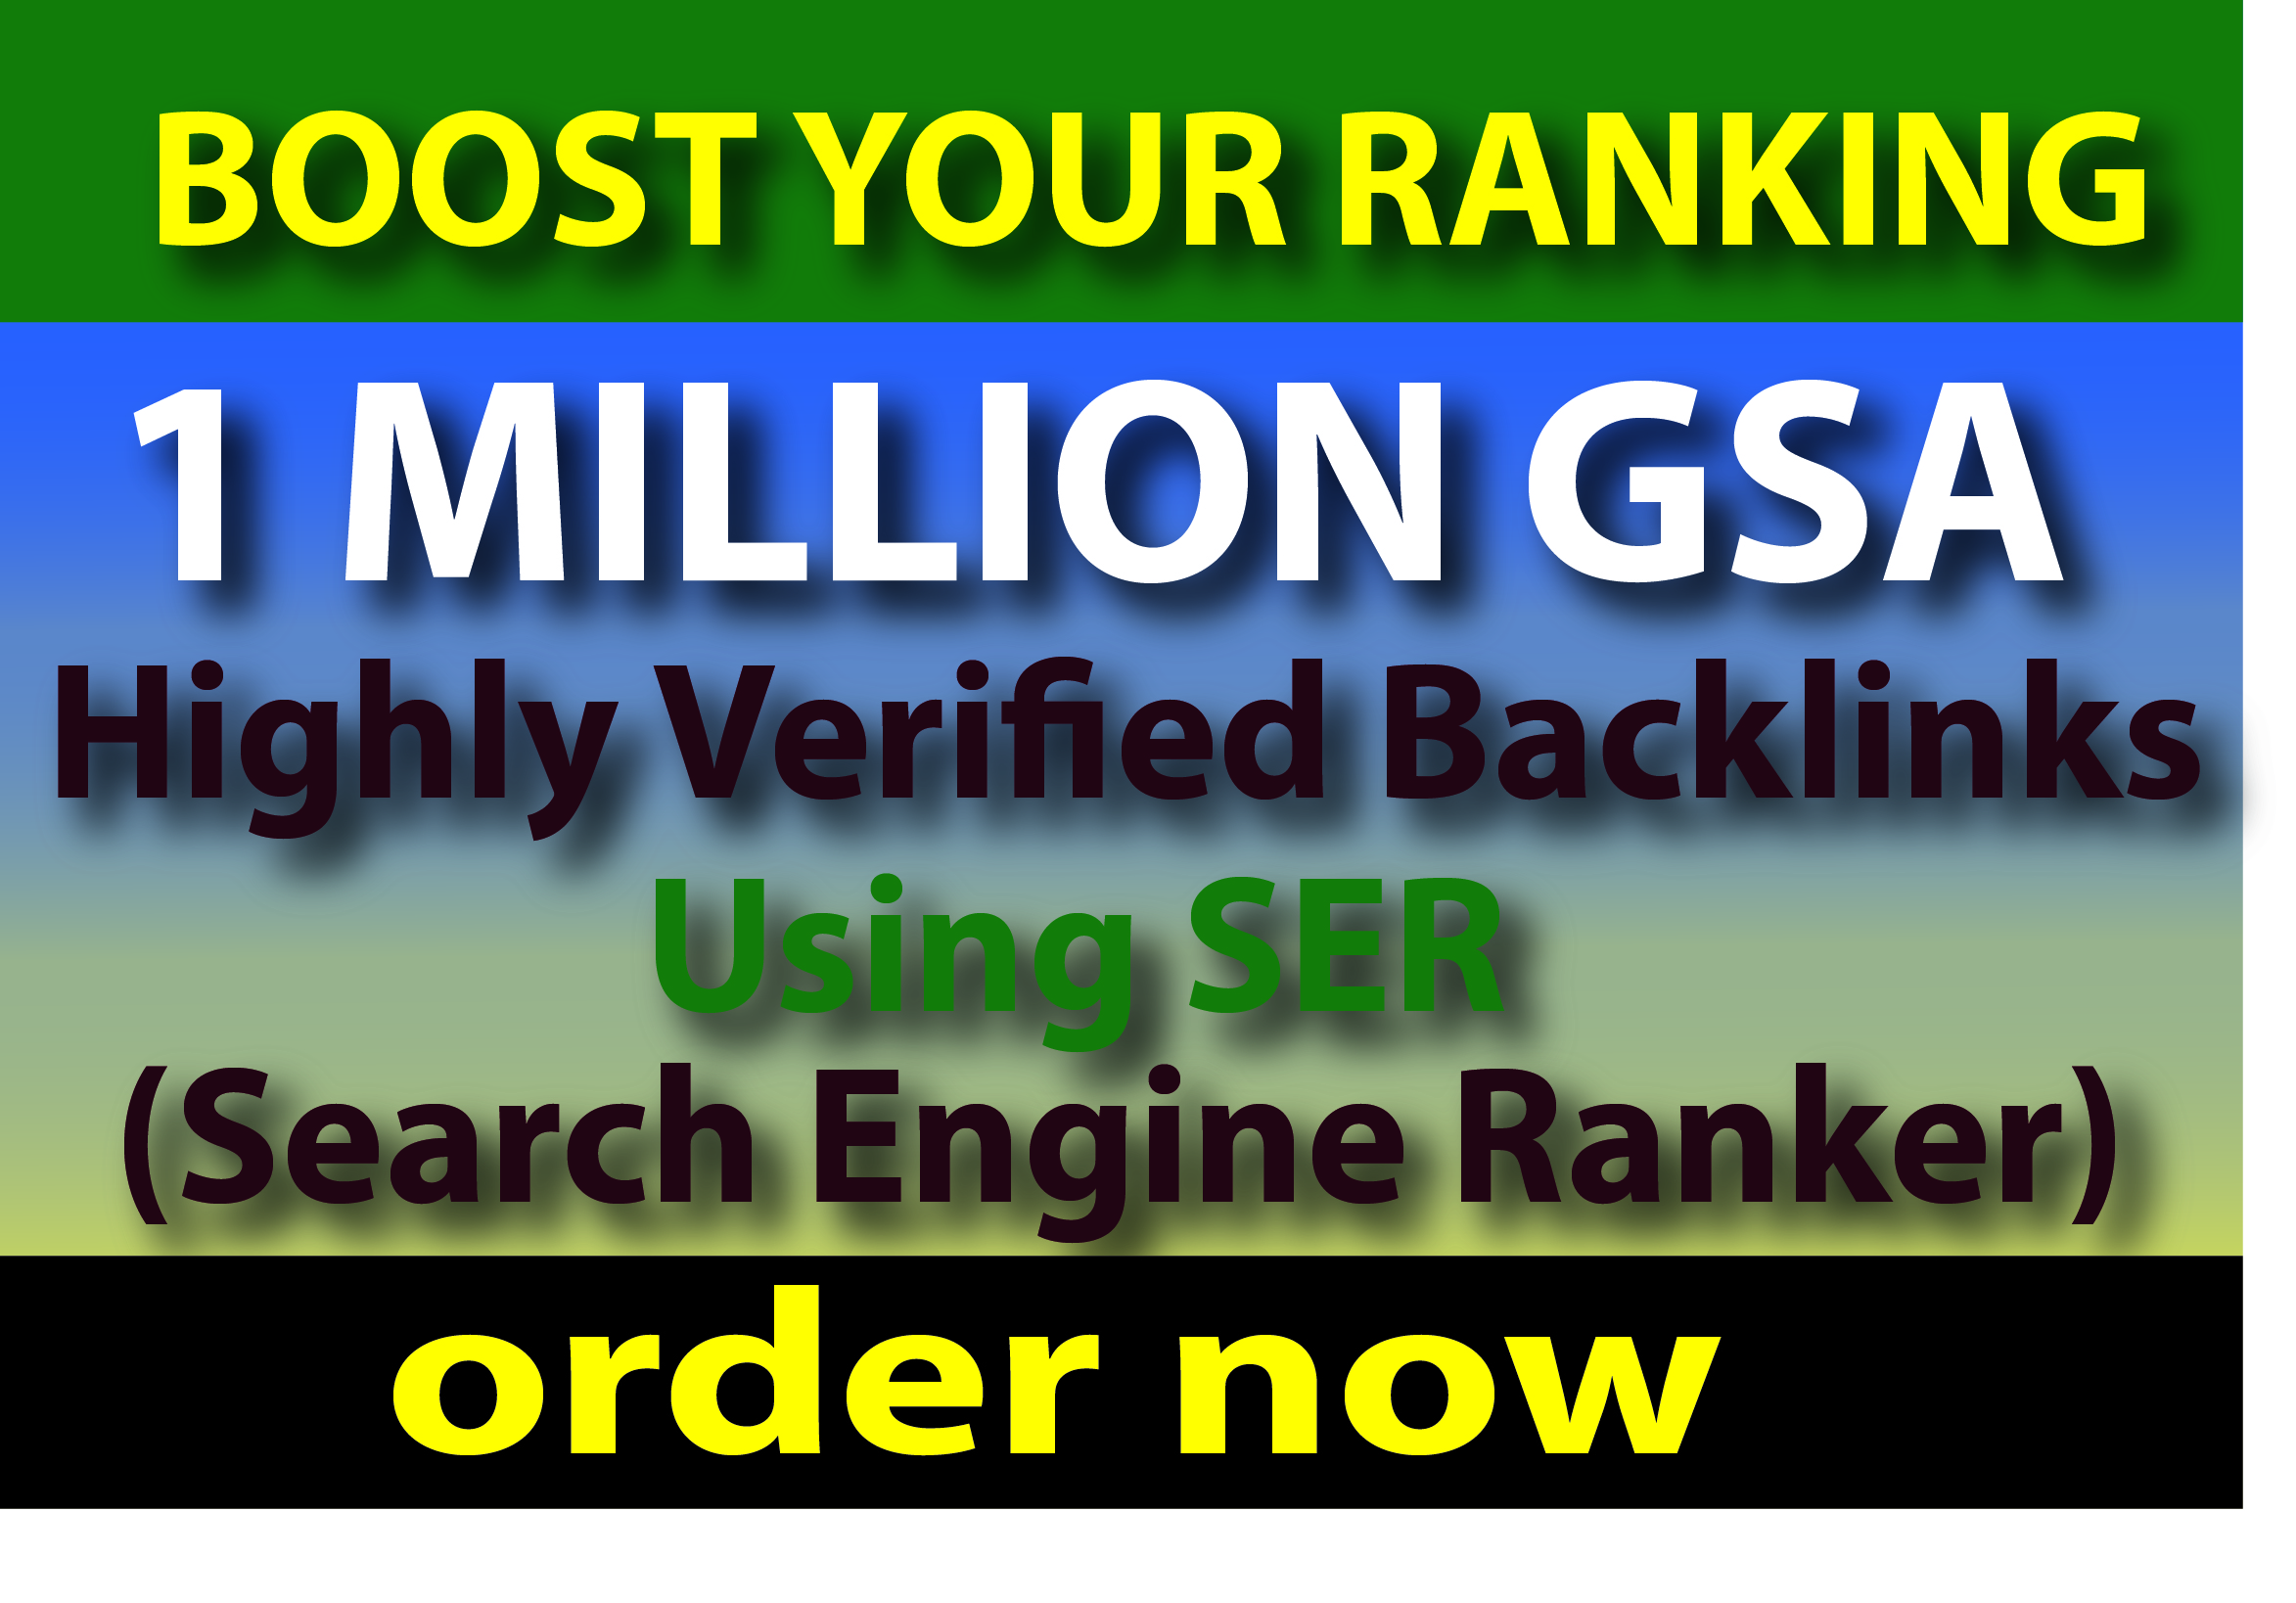 I will create 1 million verified backlinks for ranking using gsa ser